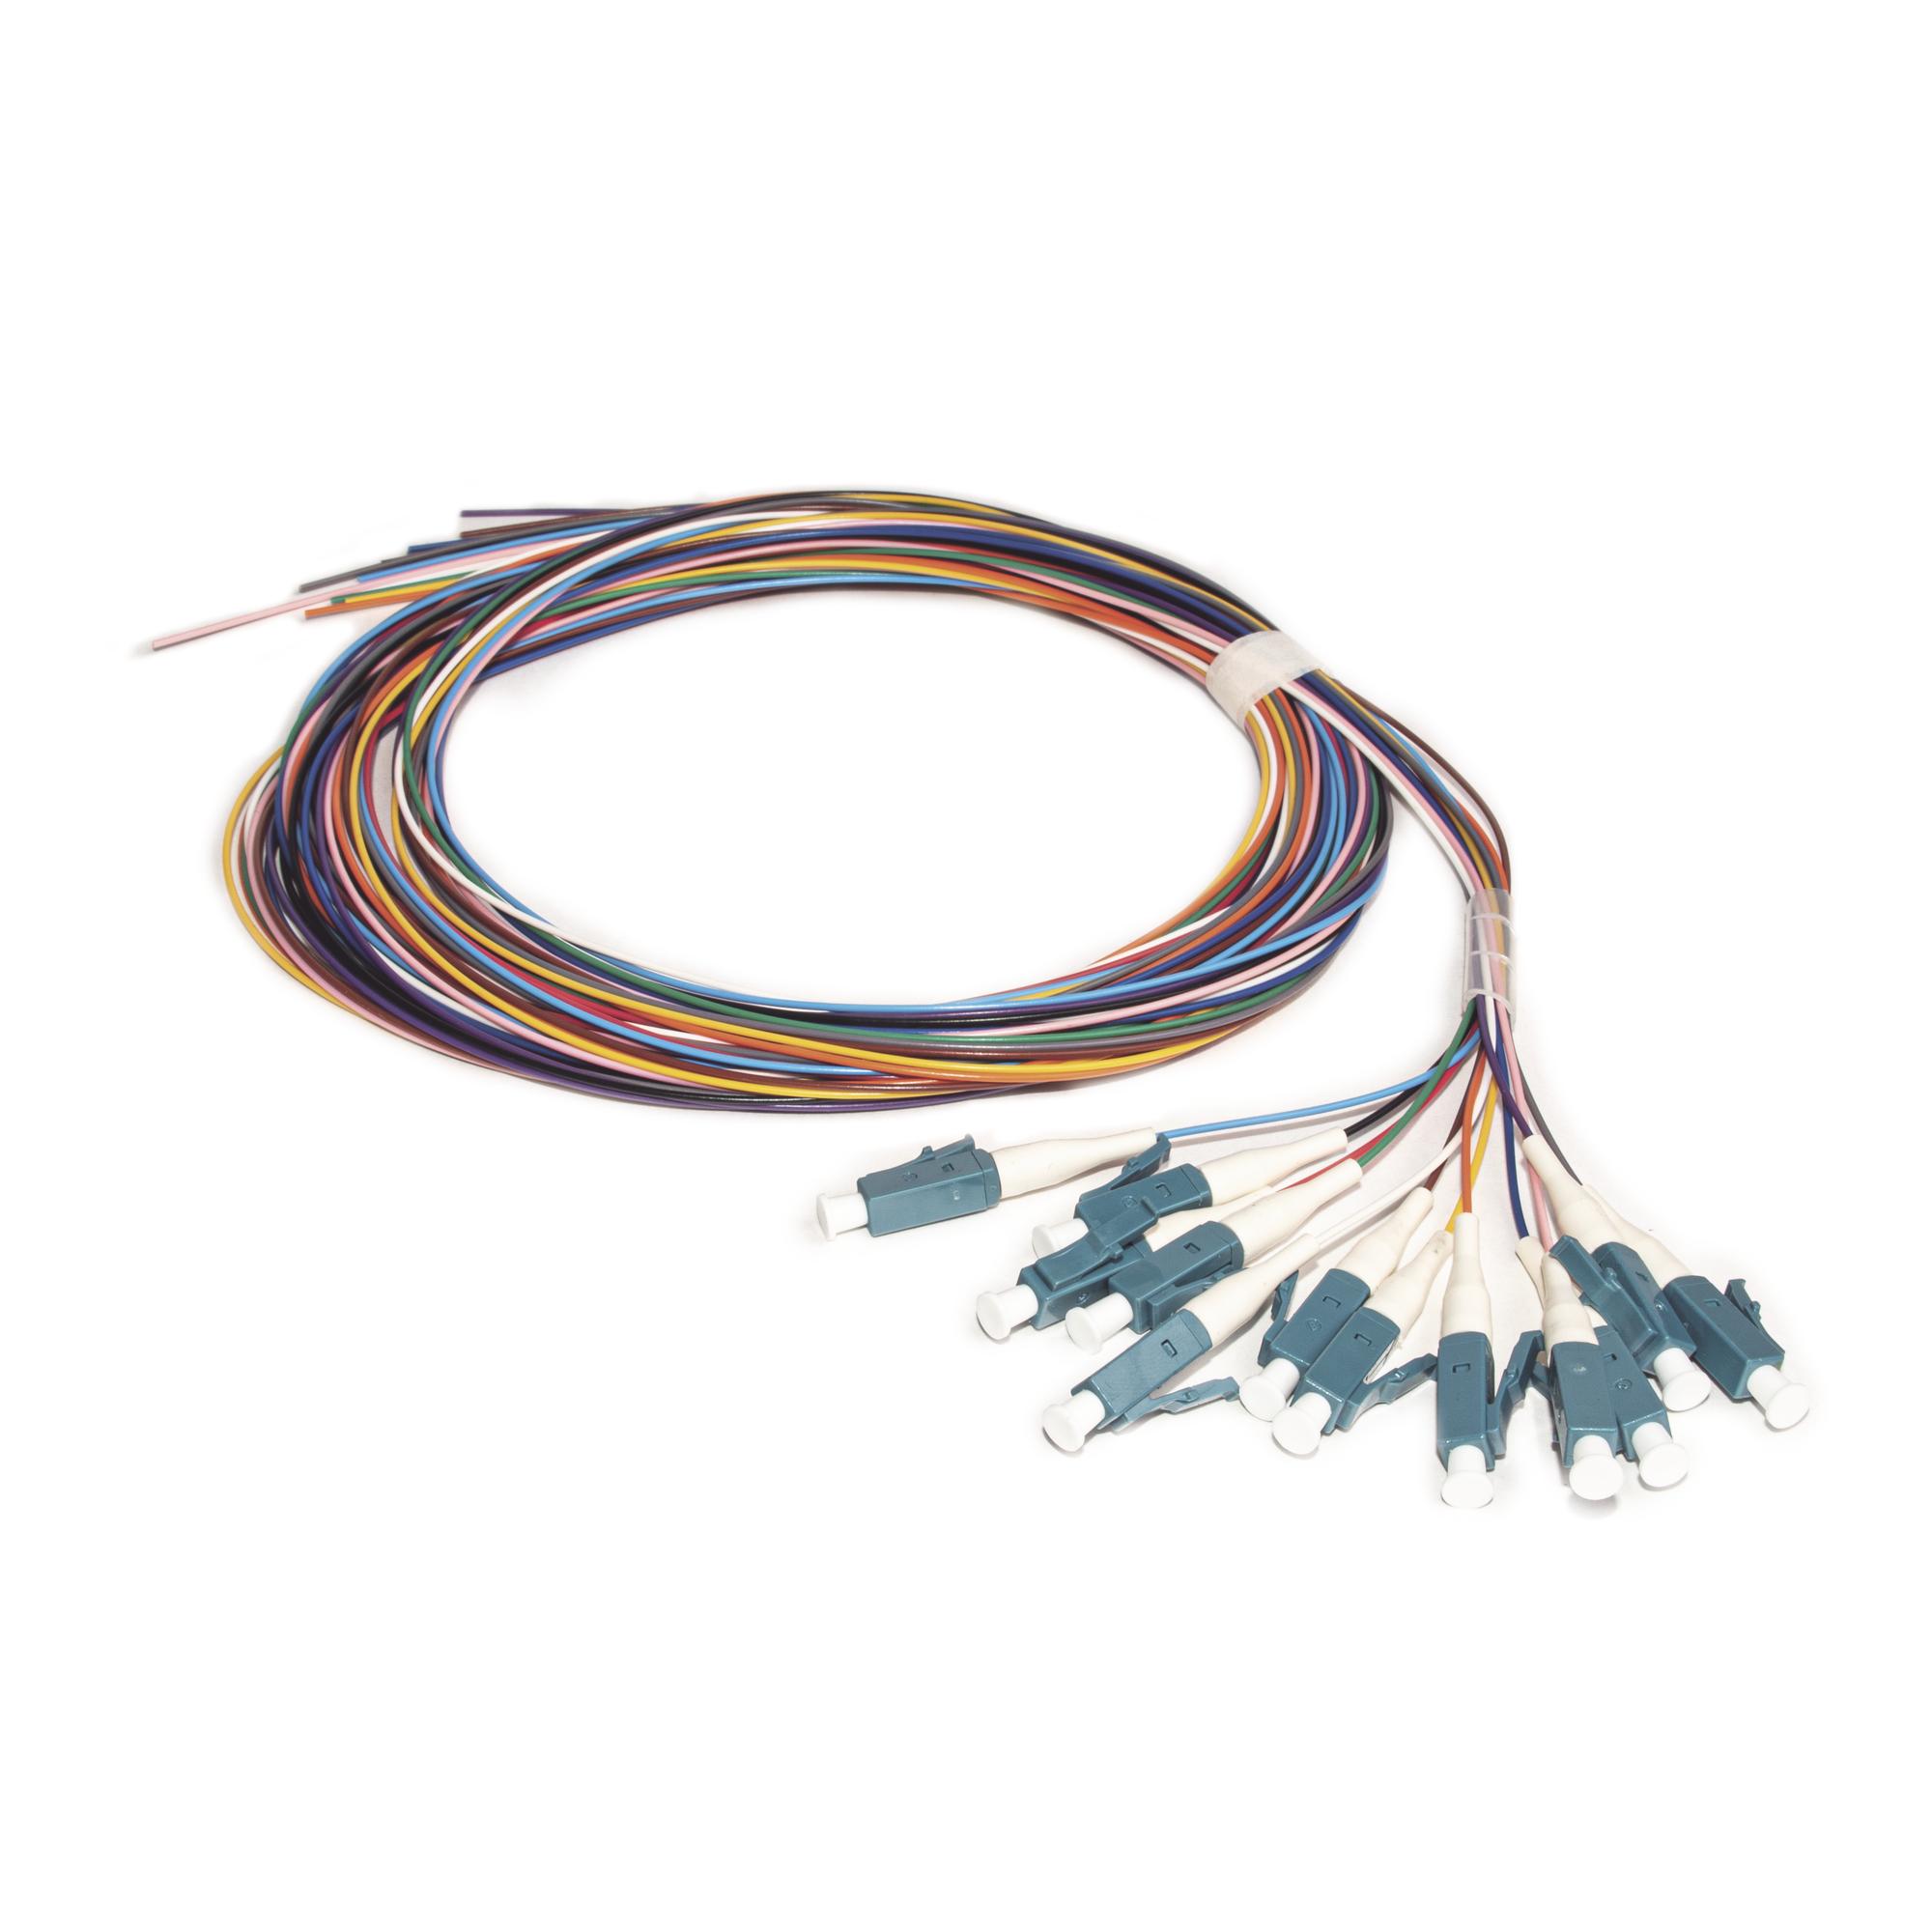 Kit de 12 Pigtails LC/UPC Monomodo 2 metros